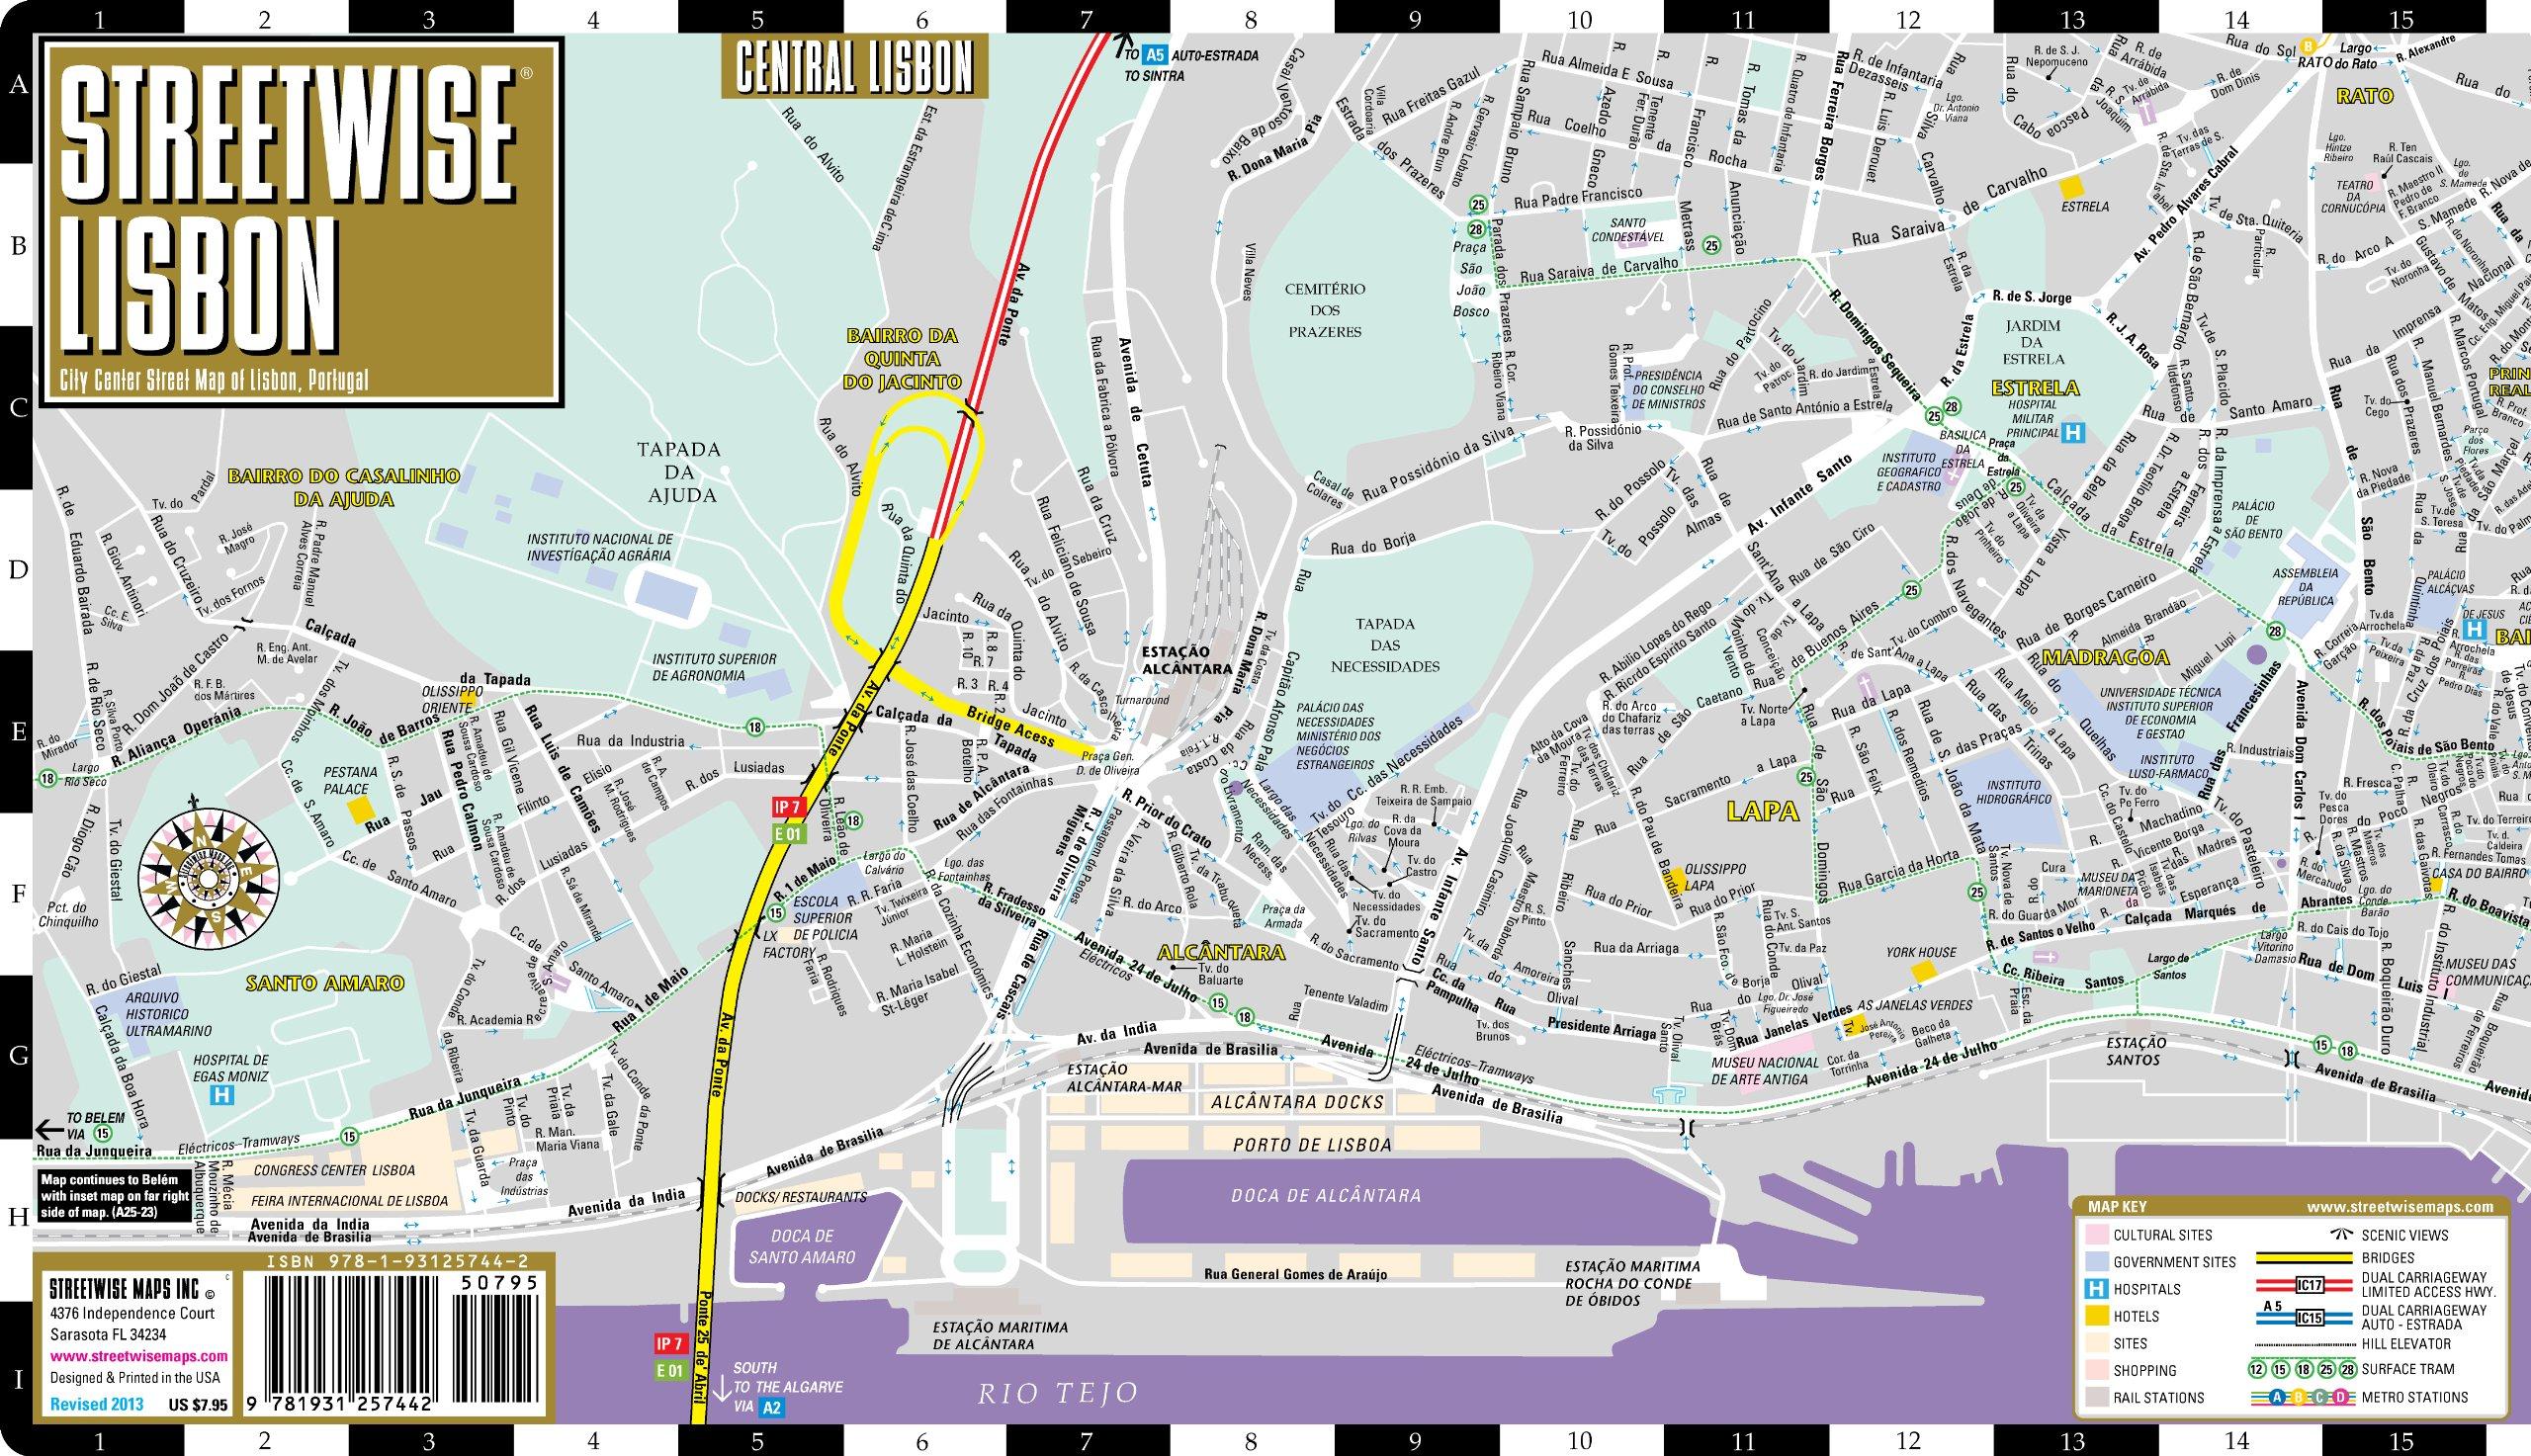 Streetwise Lisbon Map Laminated City Center Street Map Of Lisbon - lisbon map